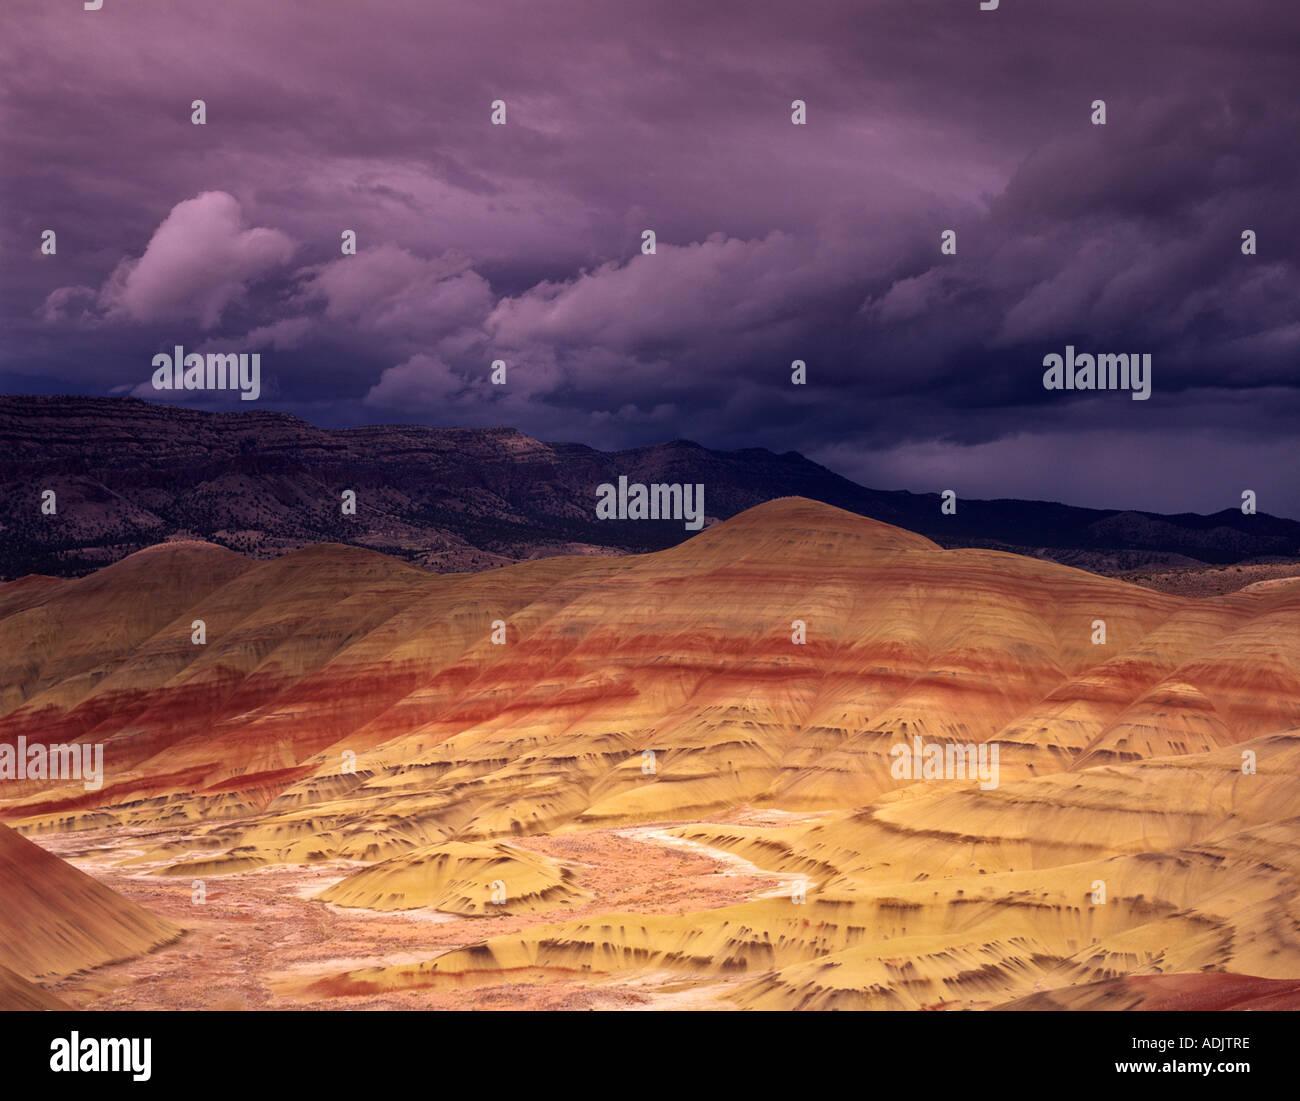 Colline dipinte con nuvole temporalesche John Day Fossil Beds National Monument Oregon Immagini Stock